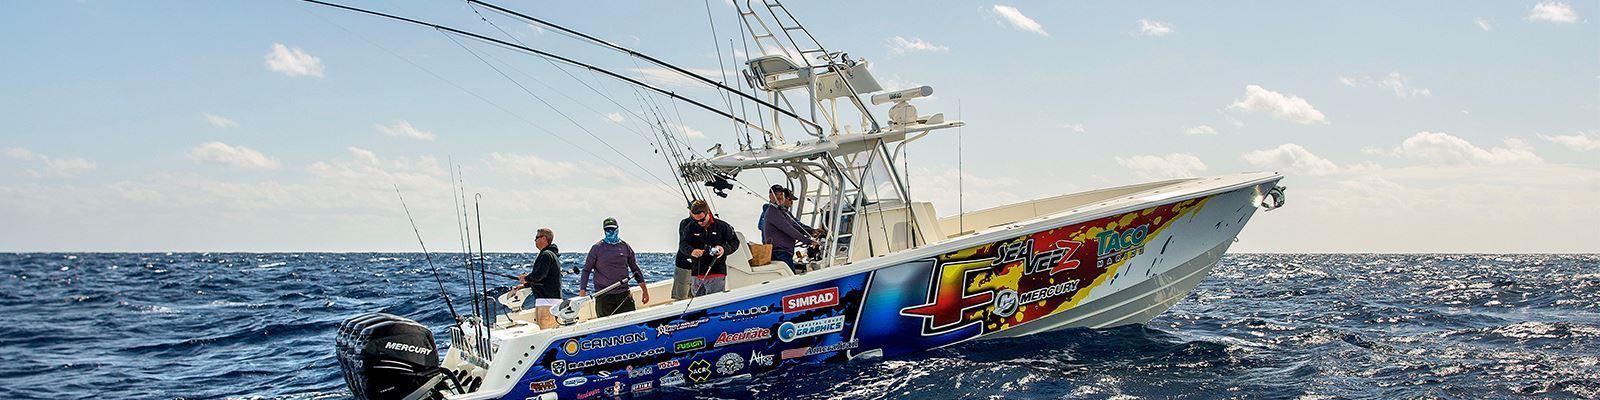 sport-fishing-store-rigging-kits-rk-0002pb